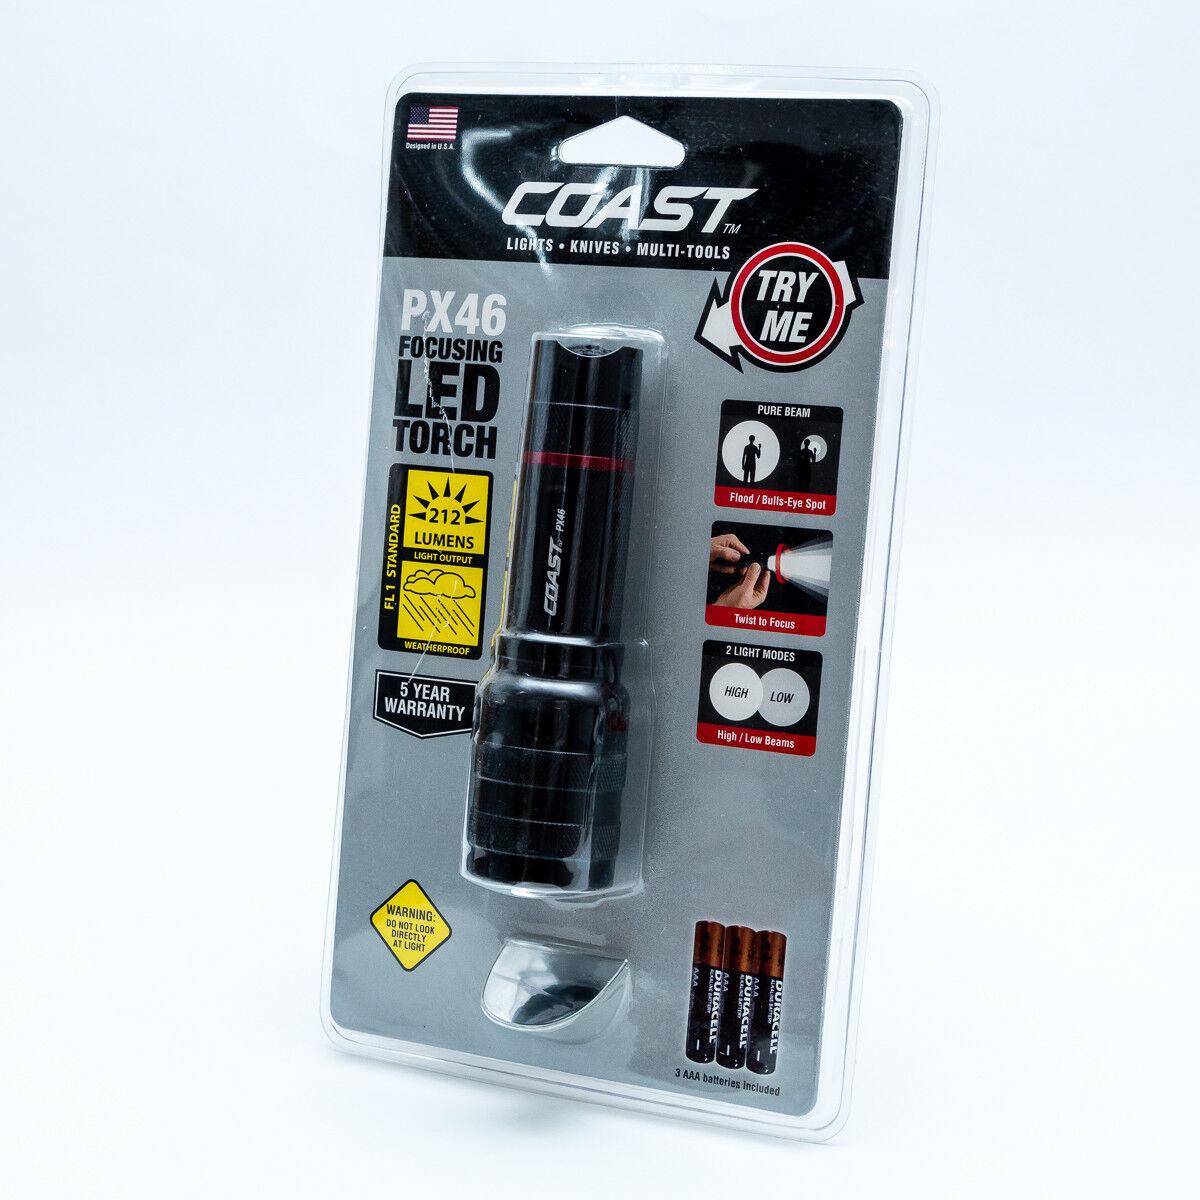 Coast PX46 High Performance LED Taschenlampe 212 Lumen Extrem Hell / NEU / Hell OVP 8c068a